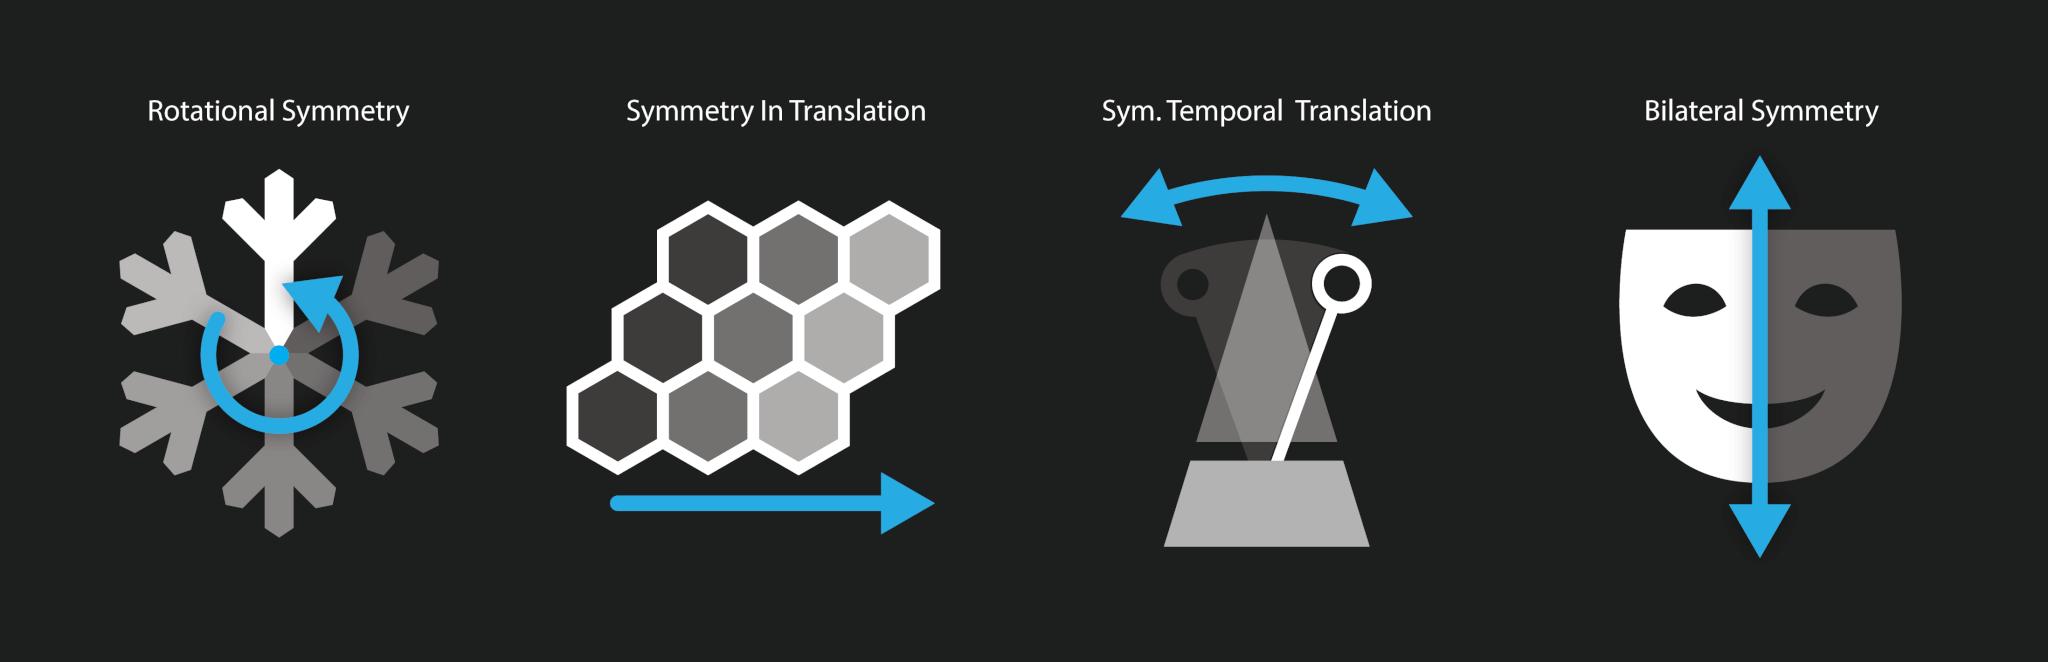 smallwood_nsf_symmetryicons